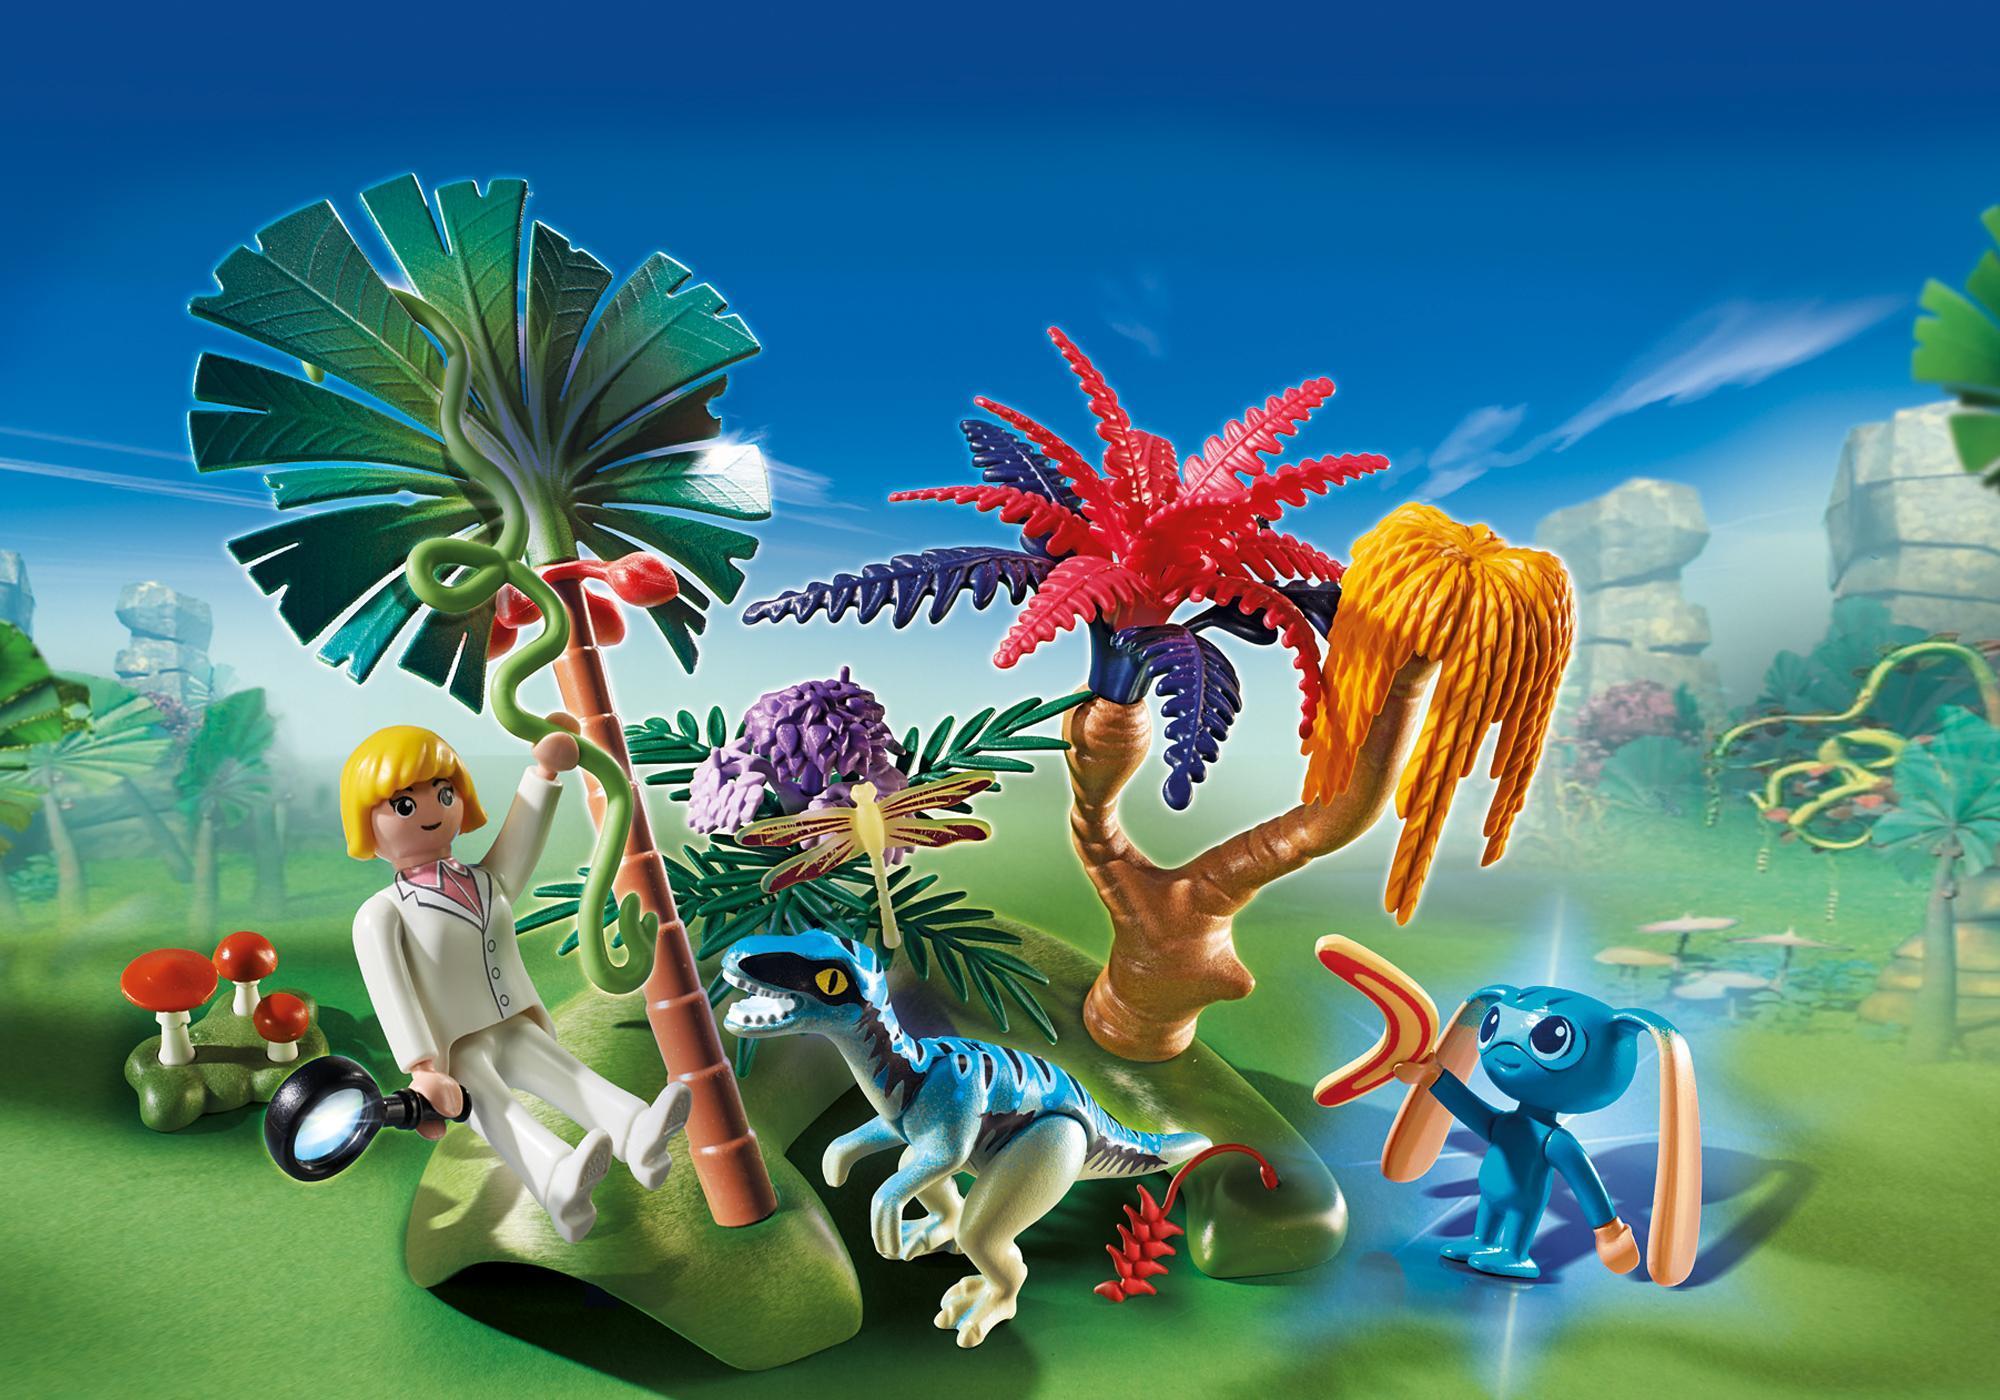 http://media.playmobil.com/i/playmobil/6687_product_detail/Lost Island mit Alien und Raptor